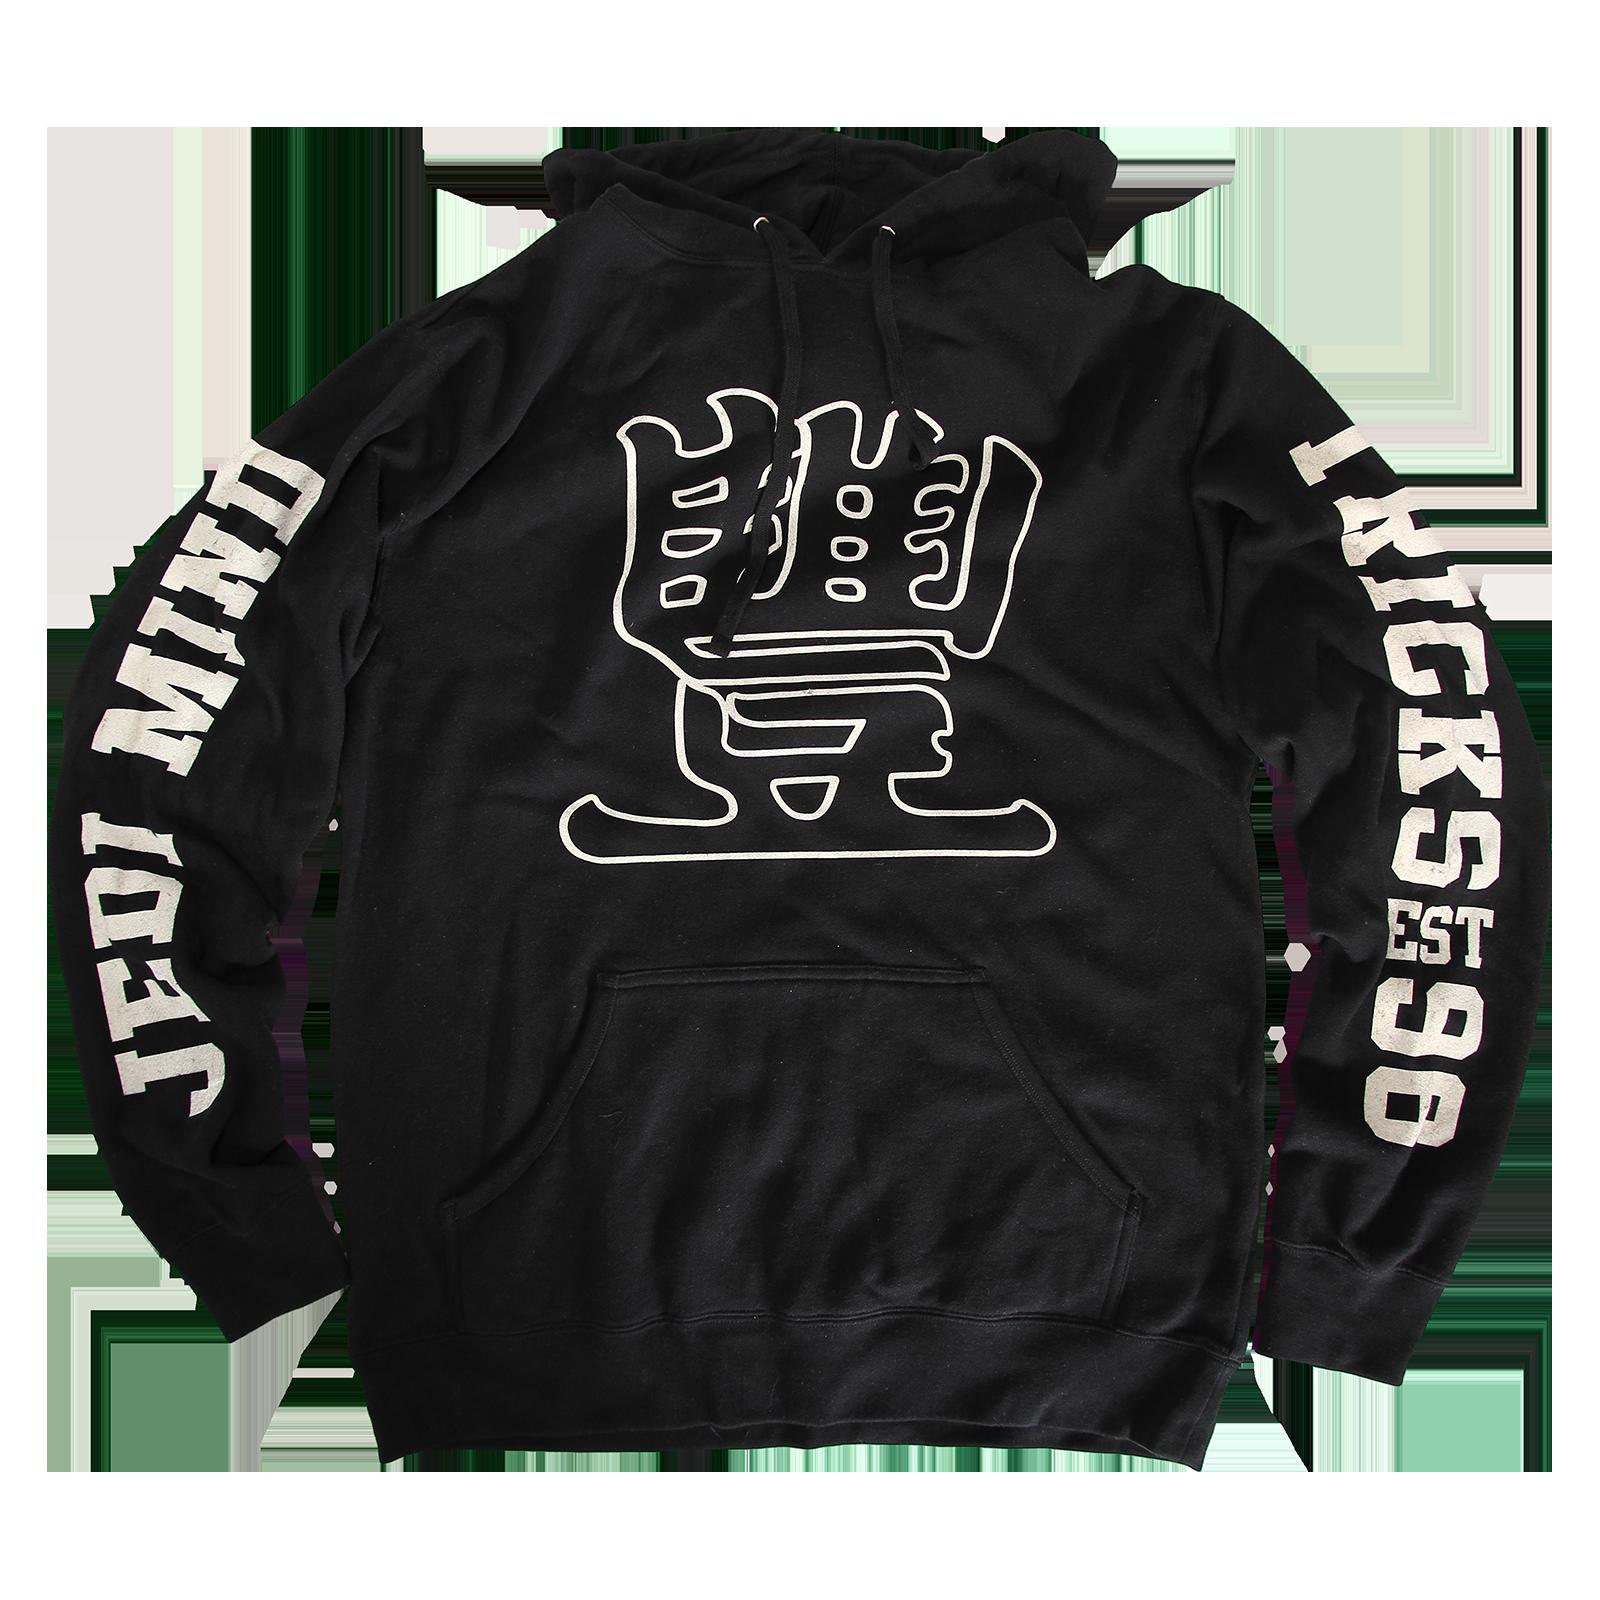 Broad Street Black Lightweight Pullover